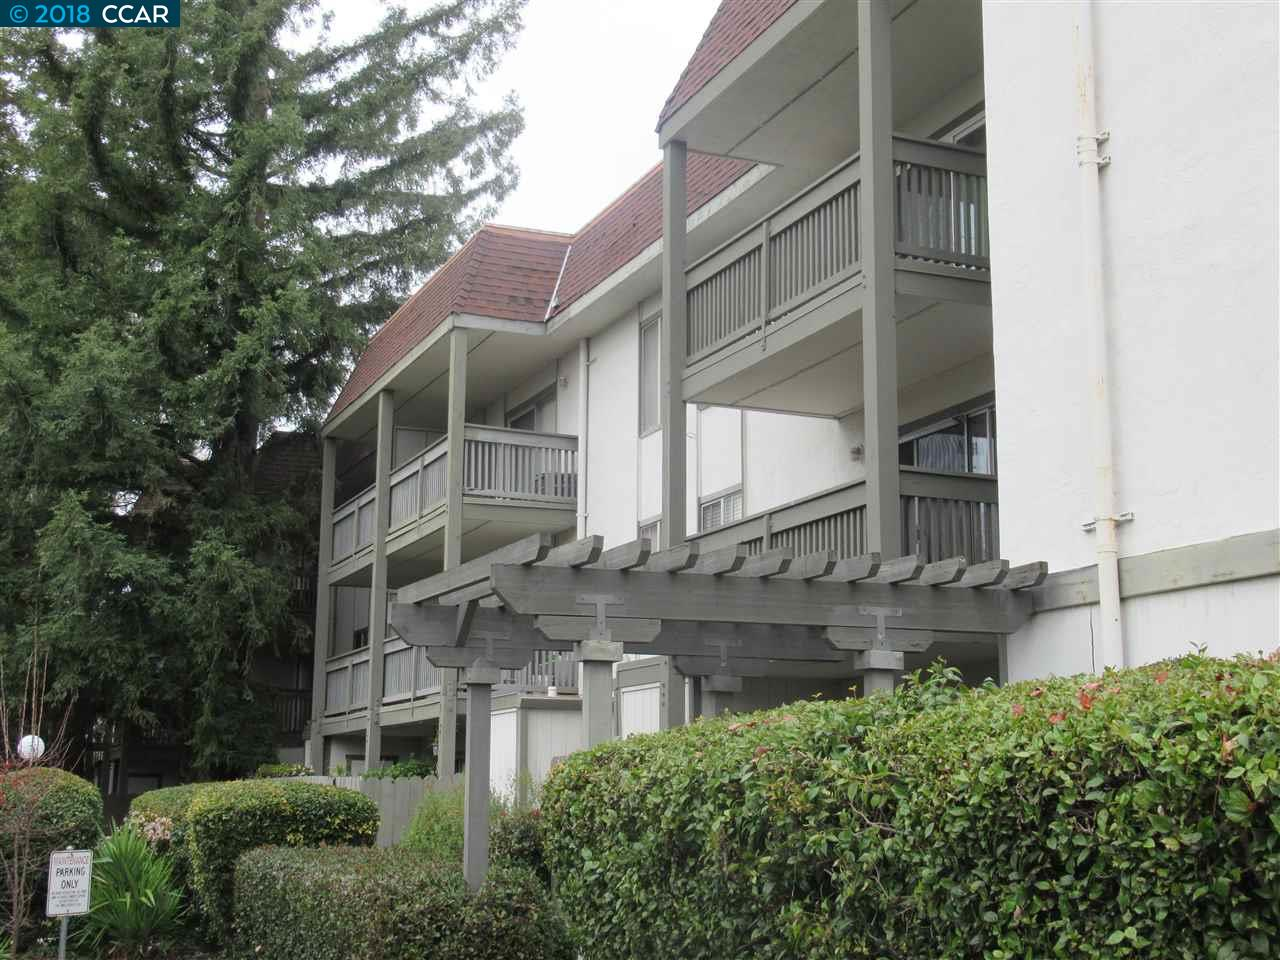 4081 Clayton Road 4081 Clayton Road Concord, California 94521 United States